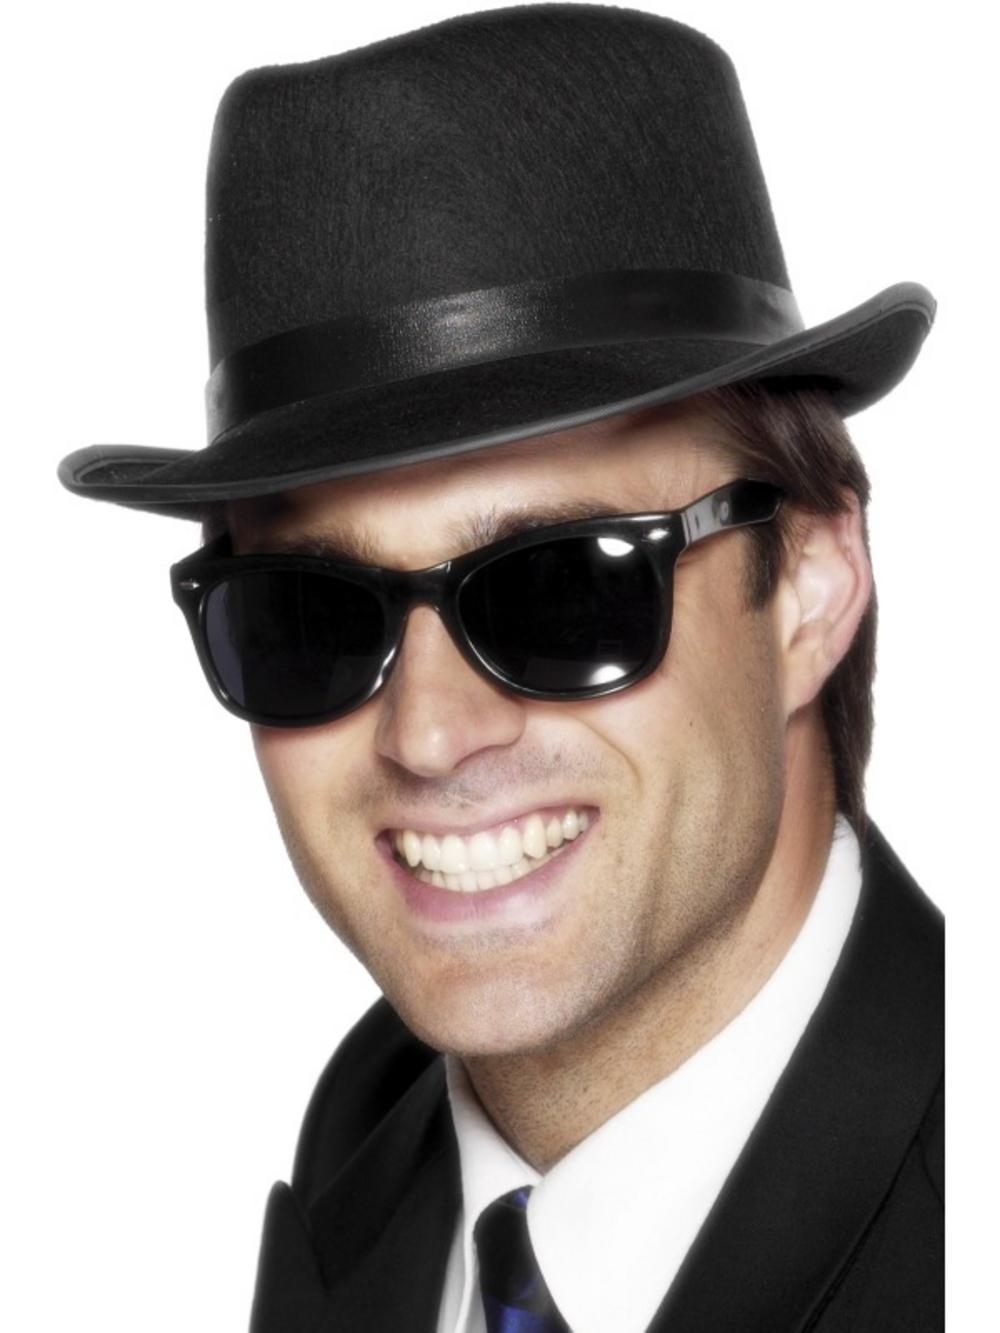 aa4cee6c5c8db Black  Cool  Shades Sunglasses Costume